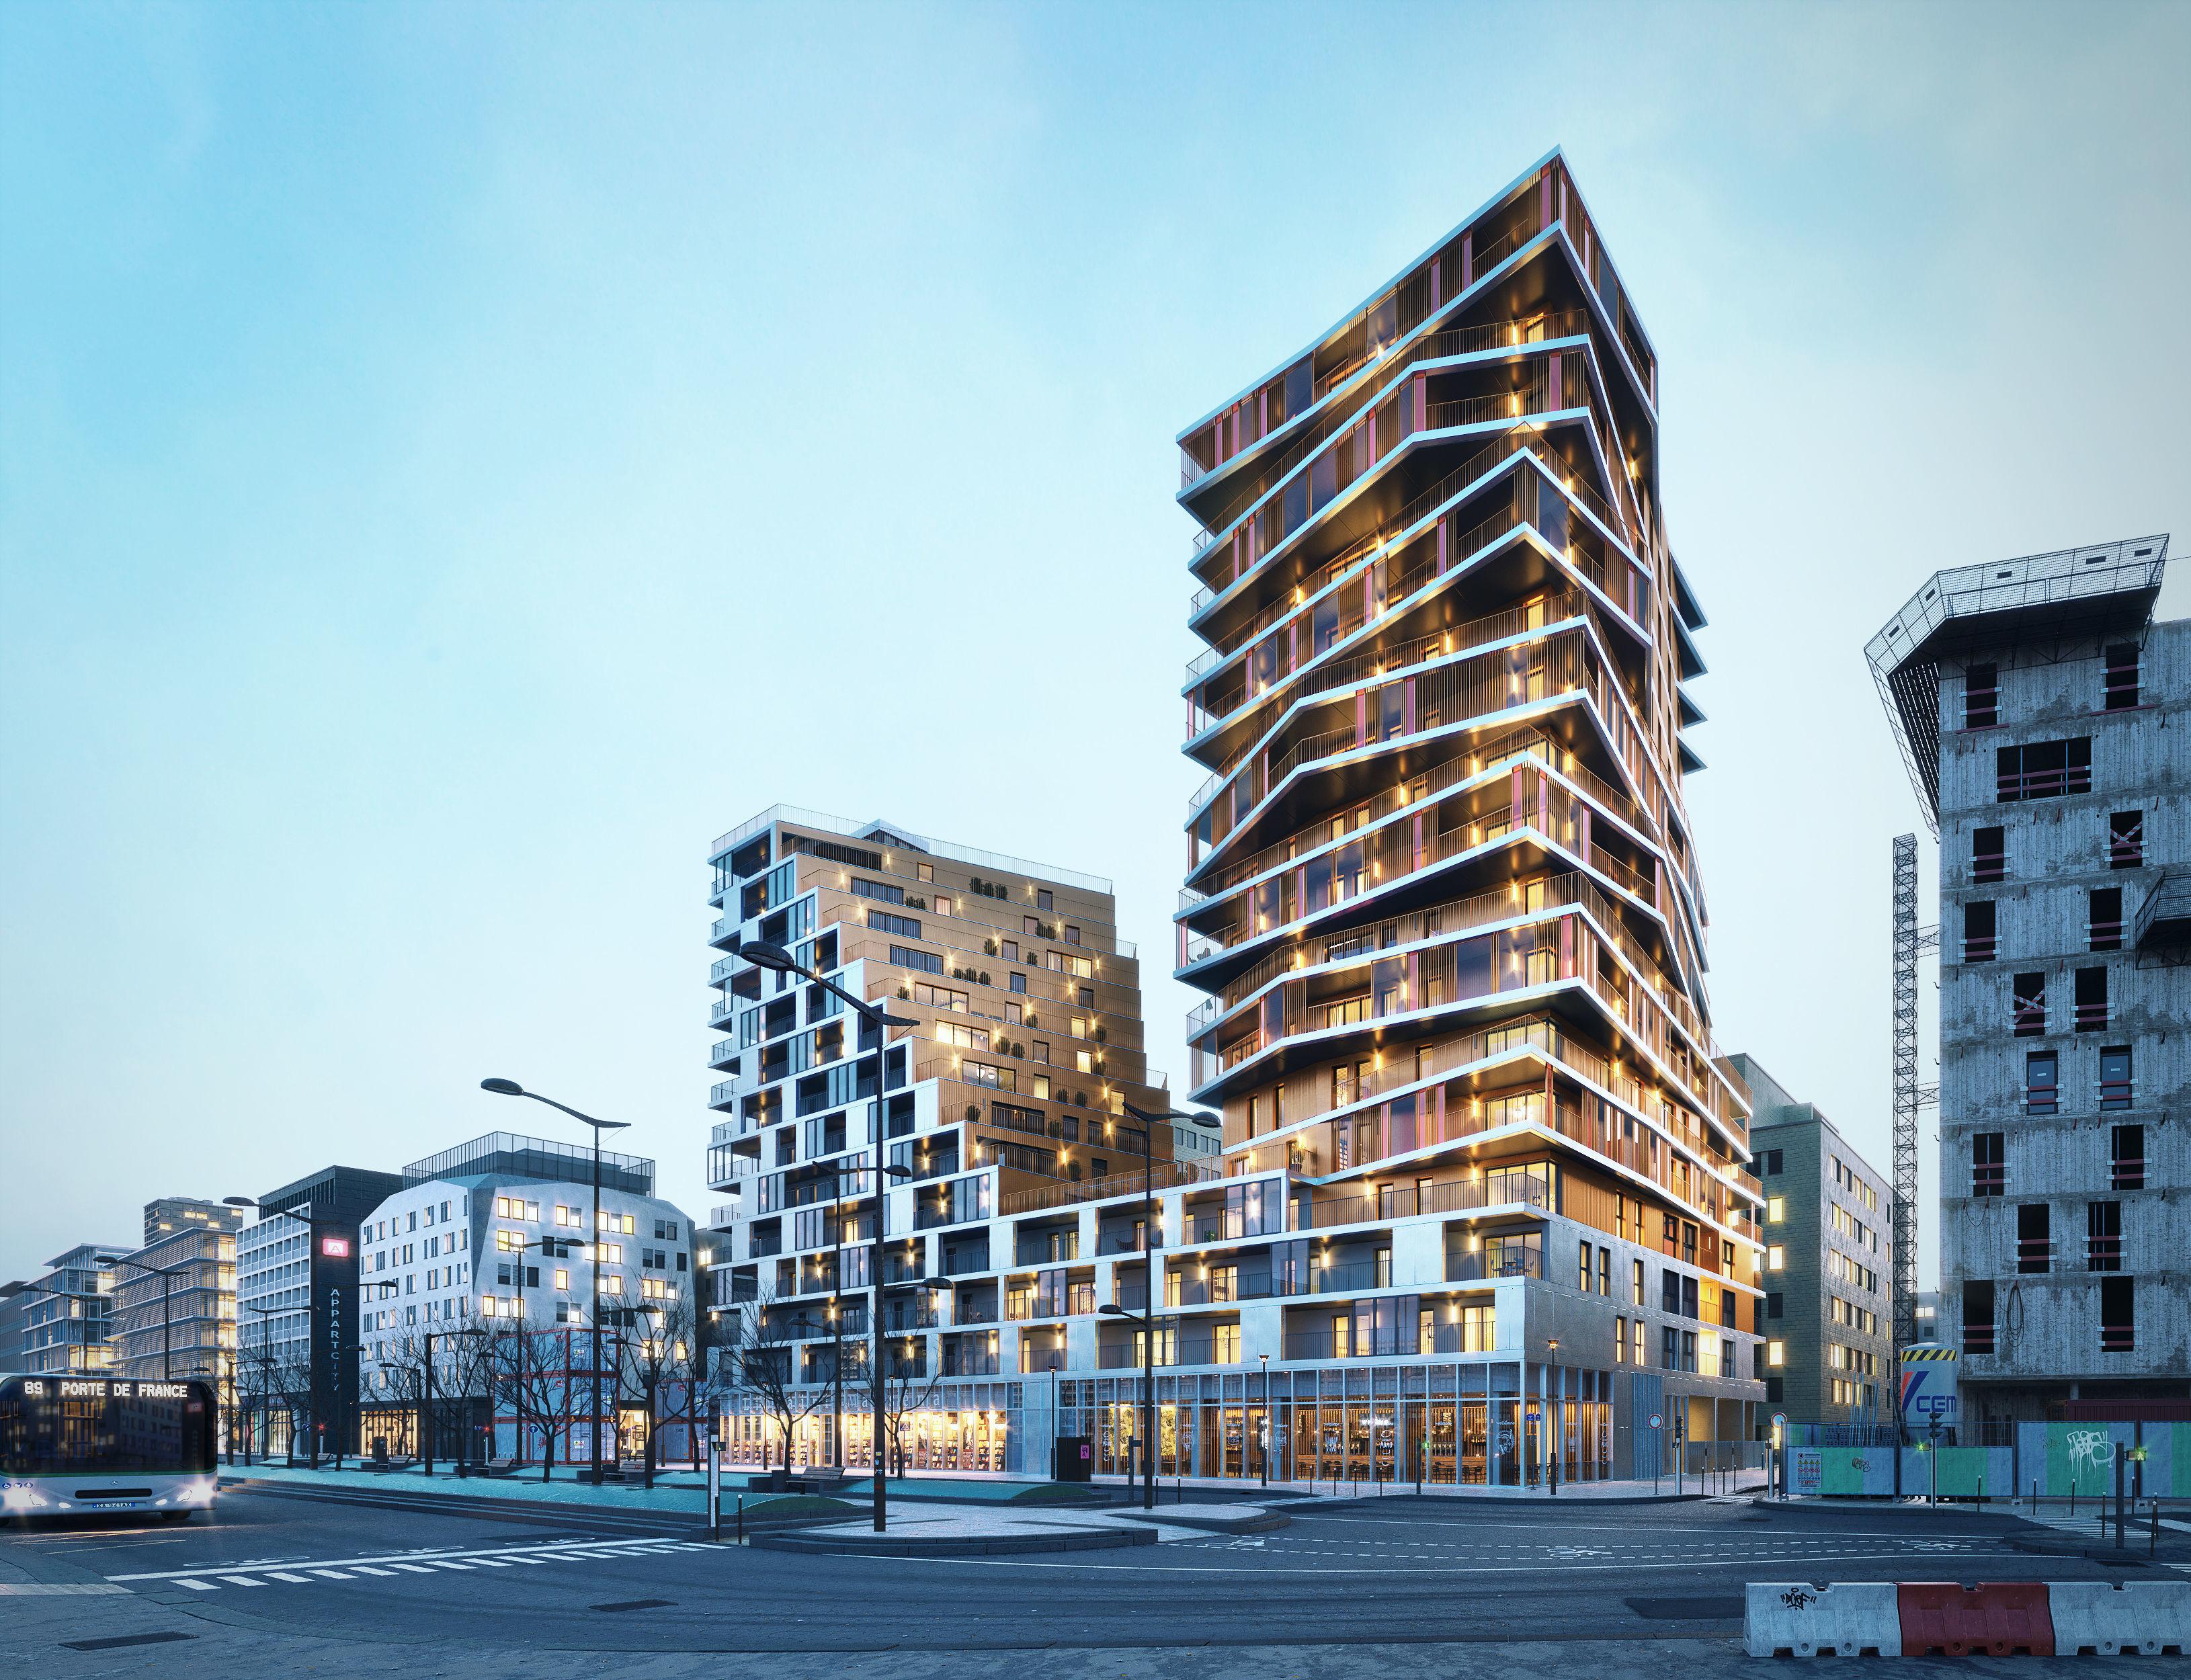 Residential high rise building in Paris